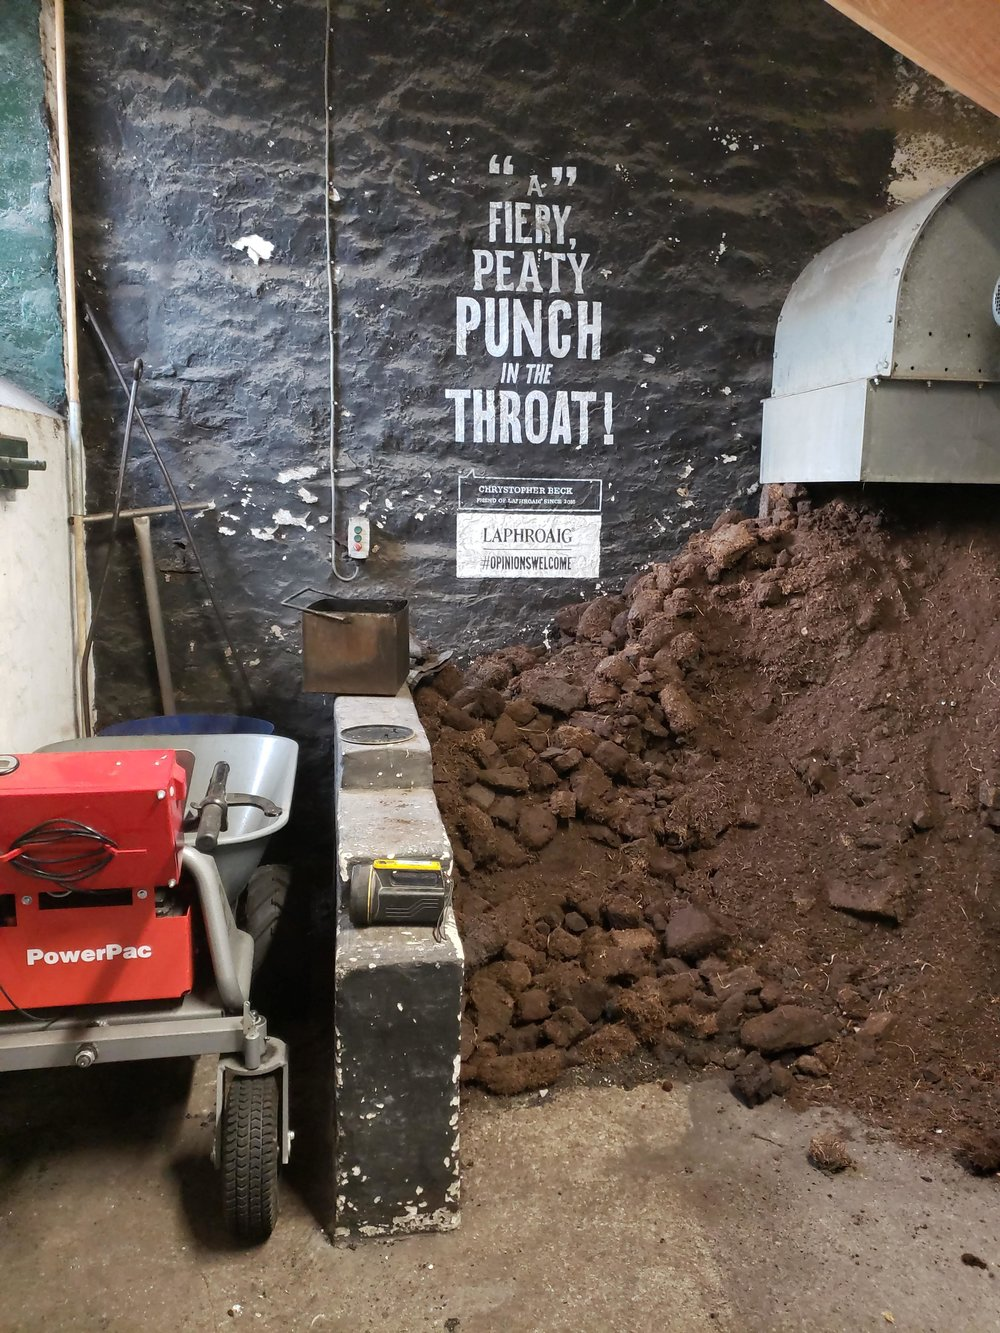 Hand-cut peat and Laphroaig's genius marketing campaign: embrace the peat!